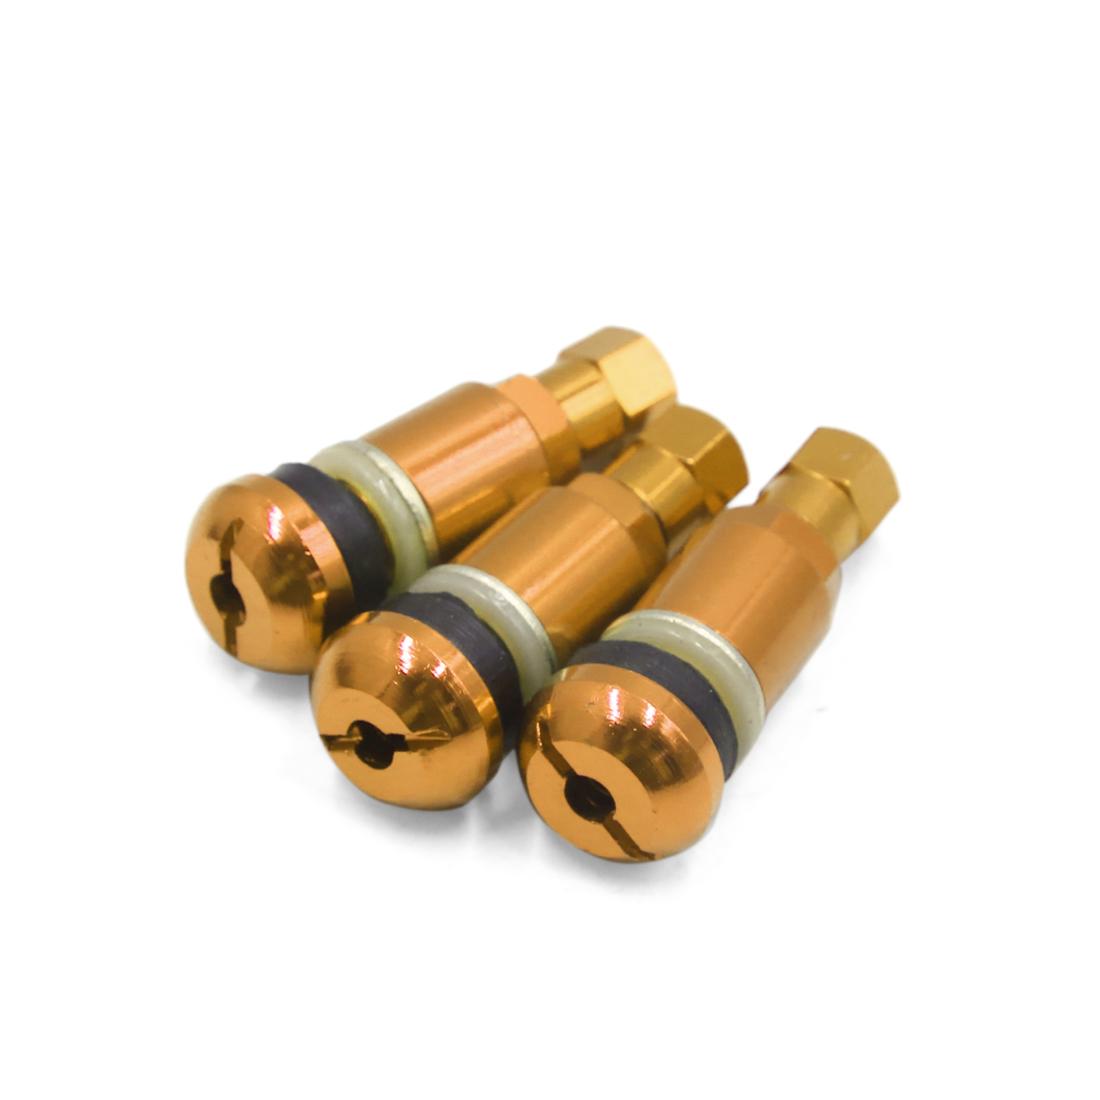 3pcs Gold Tone 45mm Length Aluminum Alloy Car Tubeless Tyre Tire Valve Stem